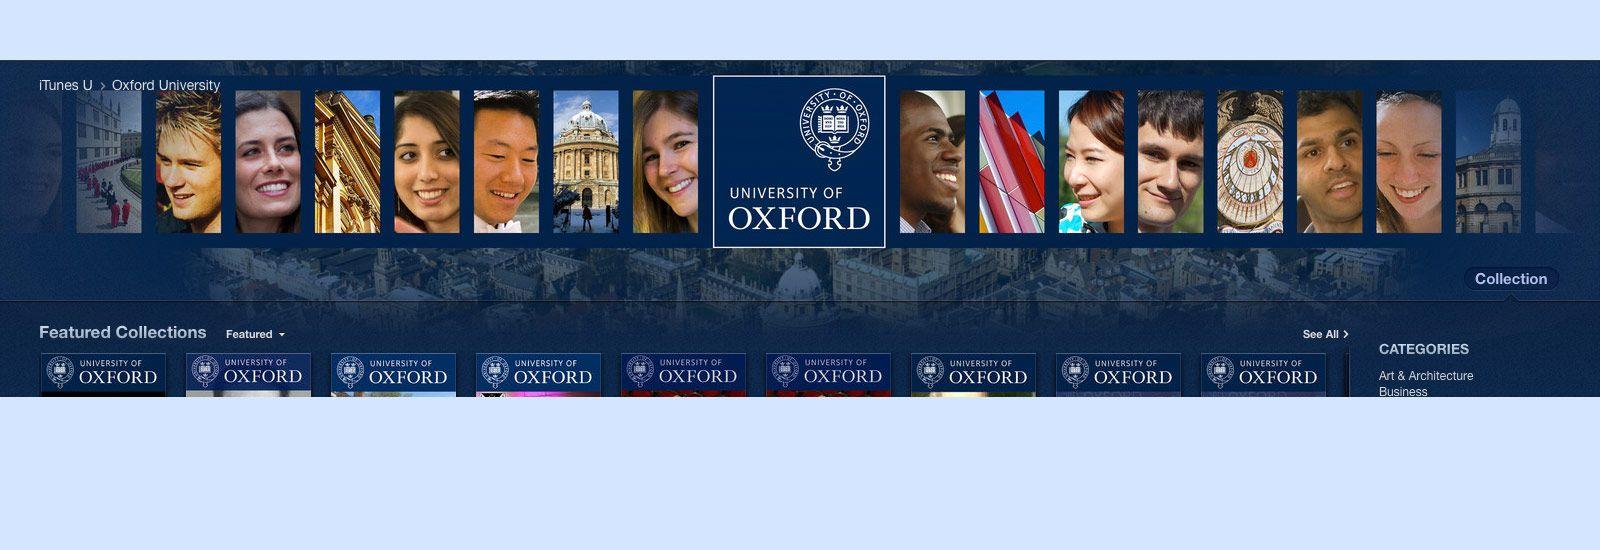 Oxford on iTunes U